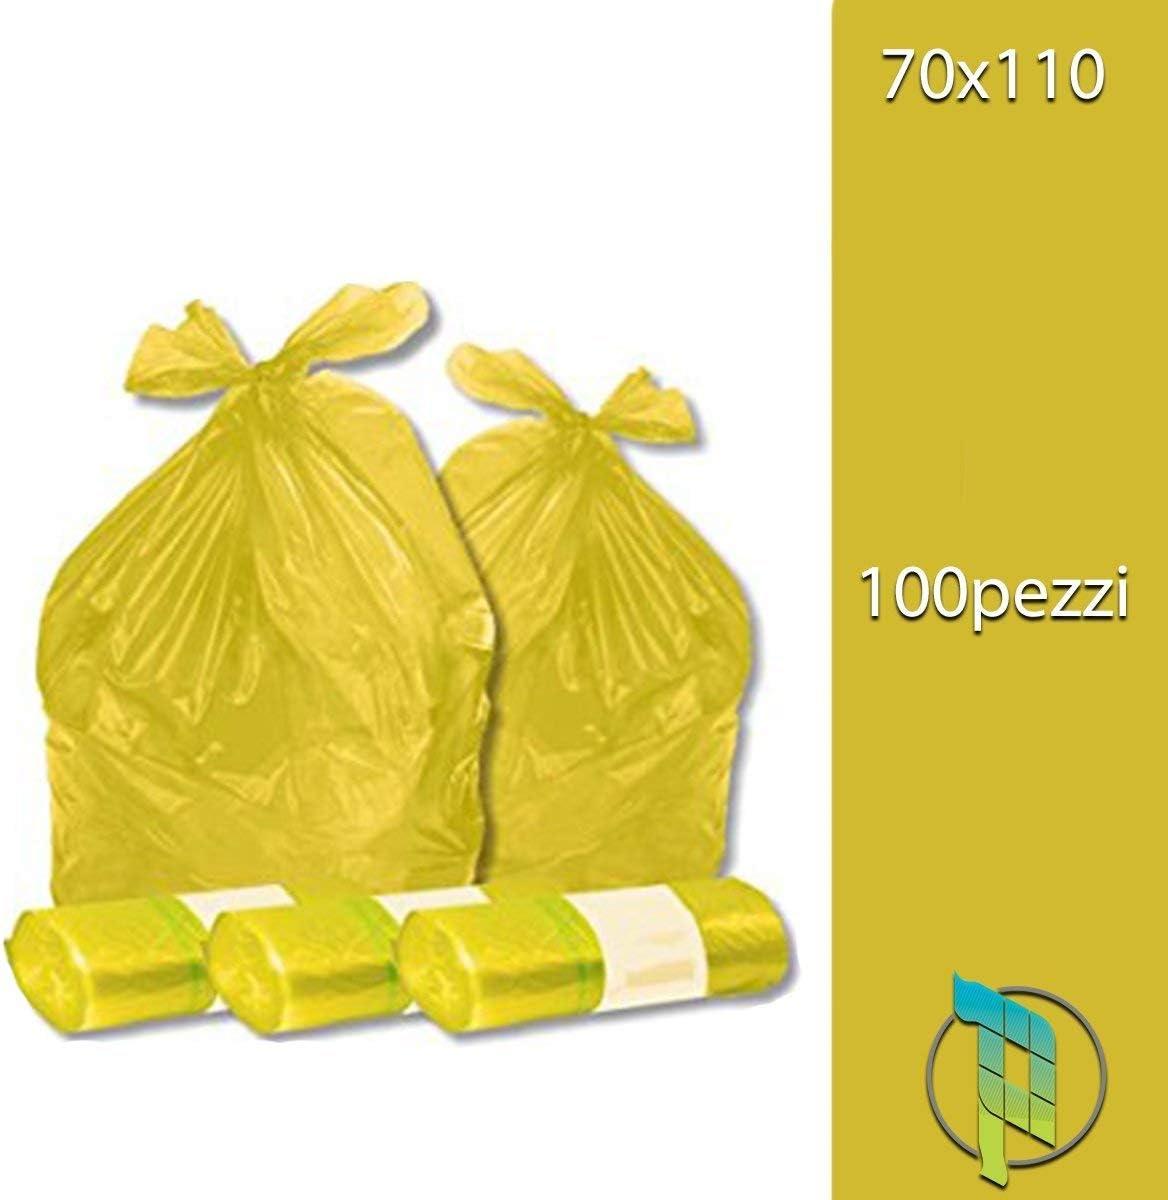 Palucart 100 pieces yellow bin bags garbage bags 70 x 110